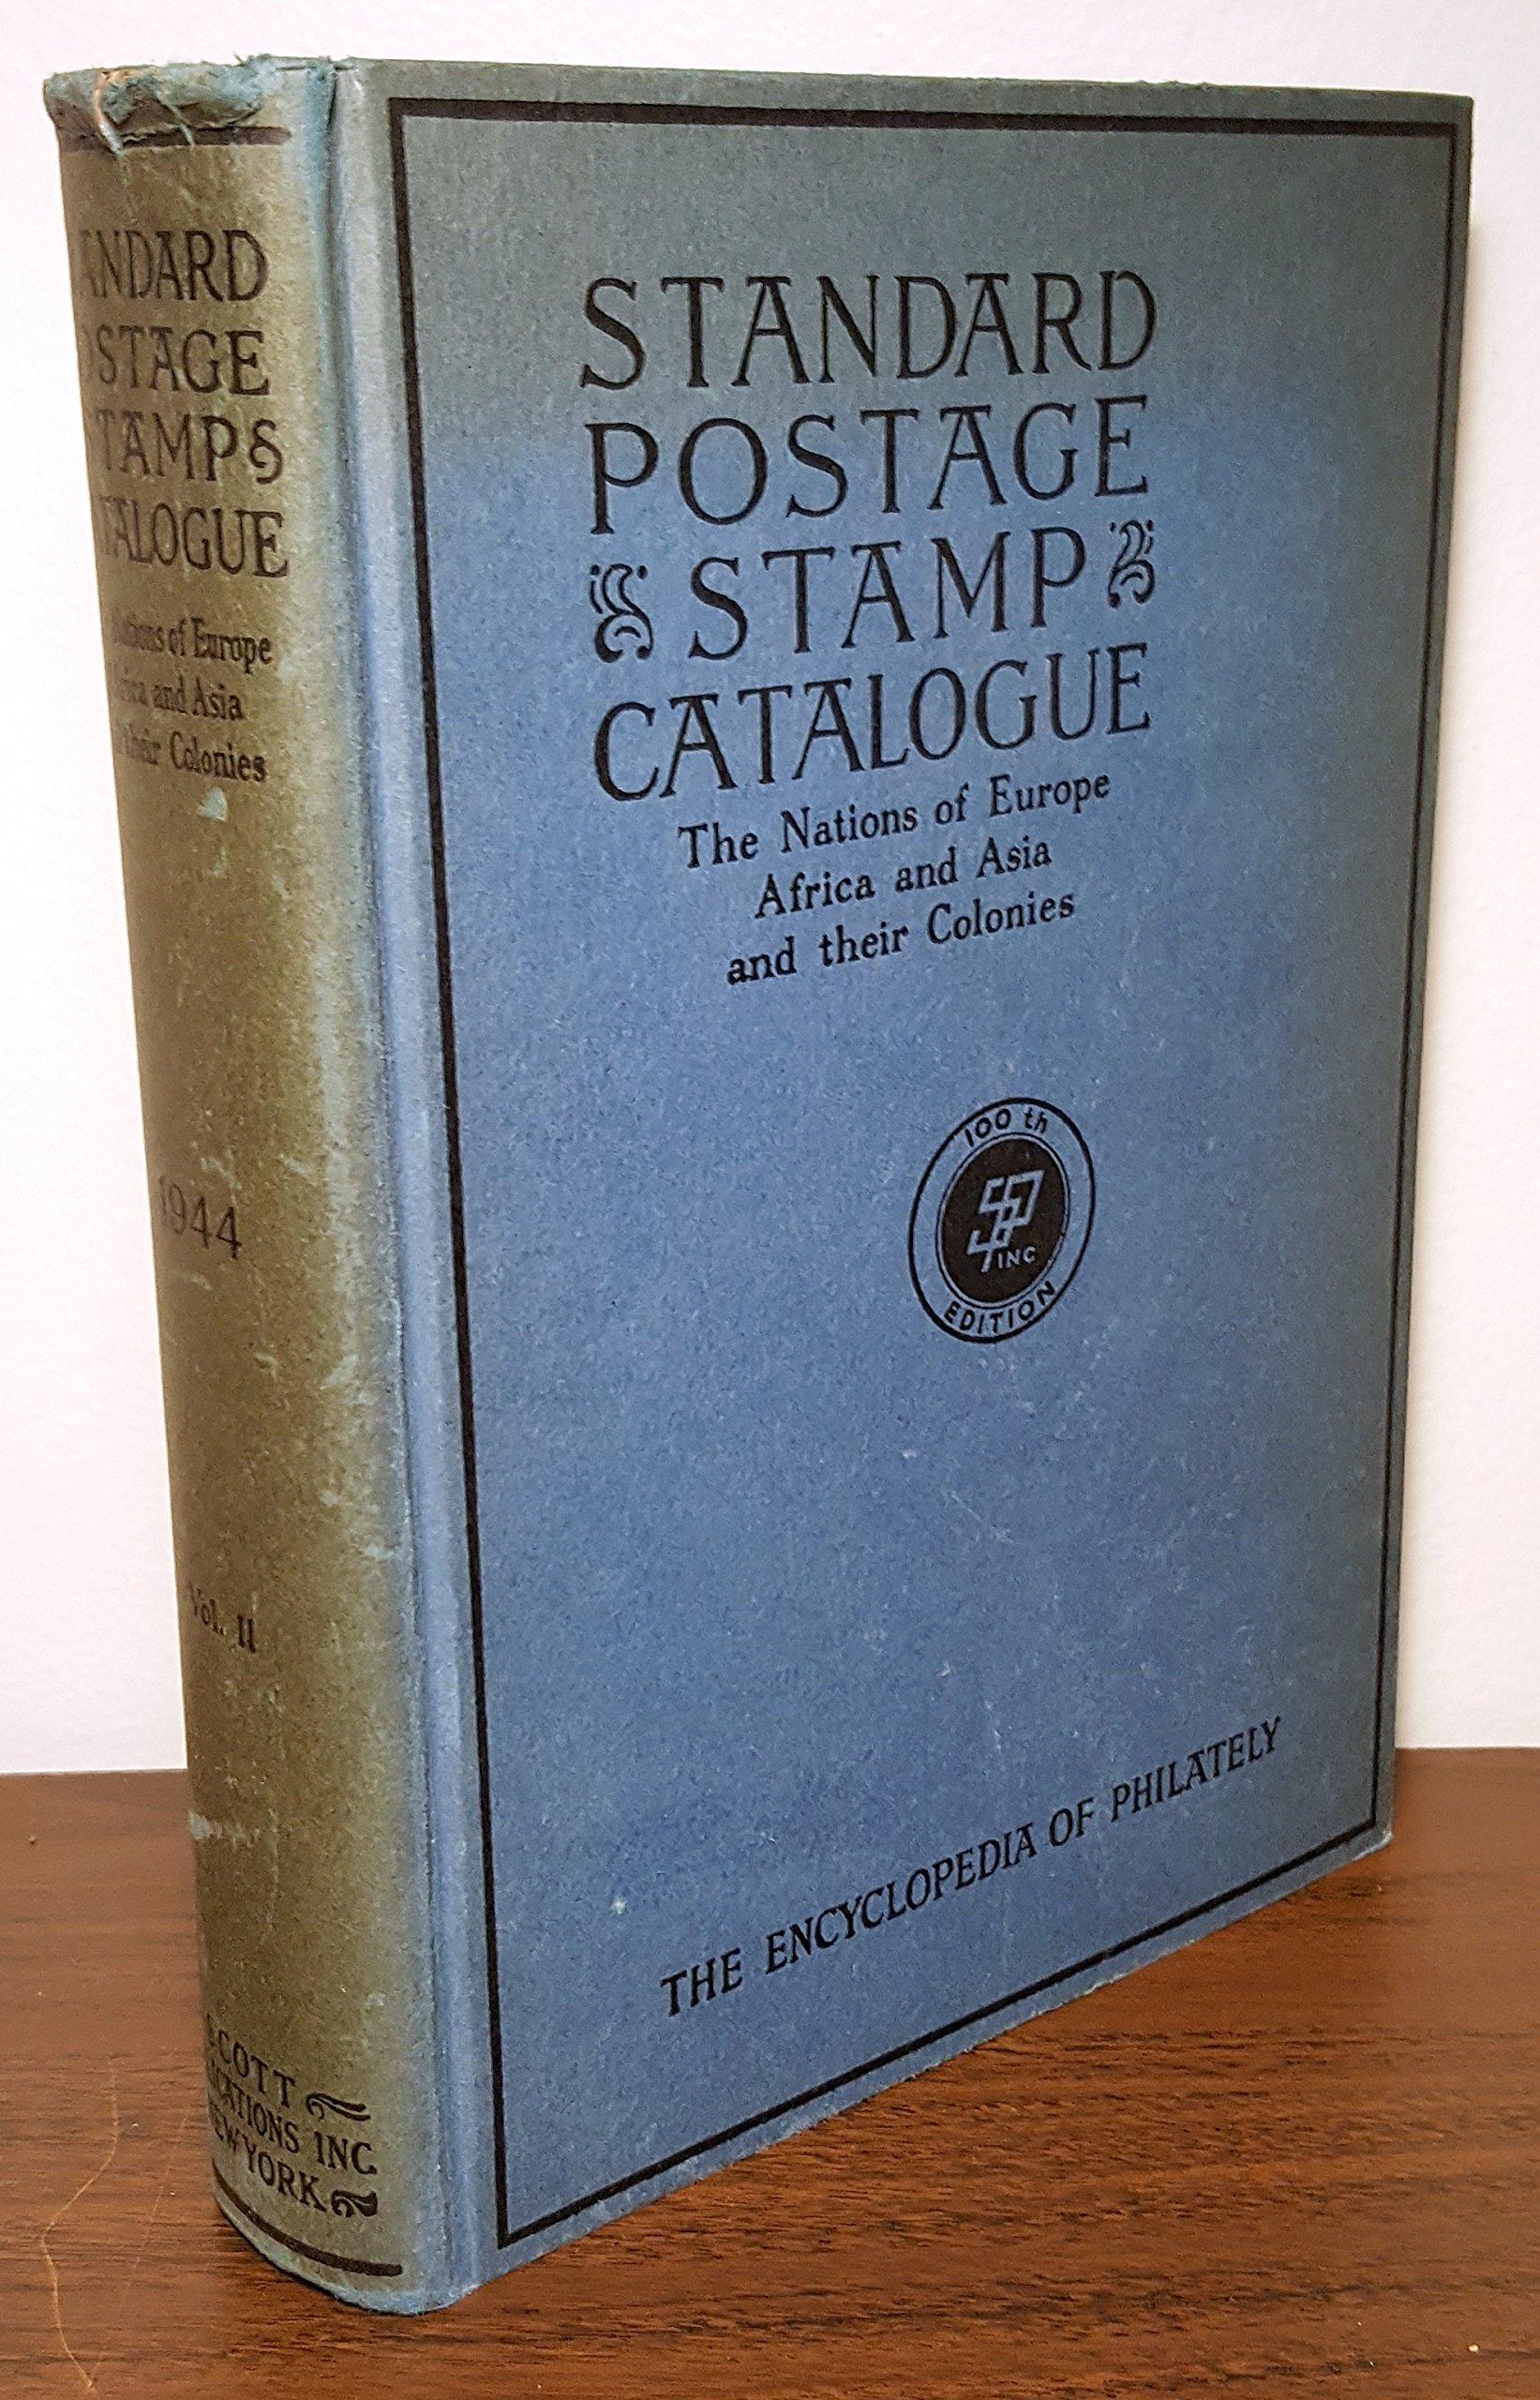 Scott's Standard Postage Stamp Catalogue: 1944: Volume 2